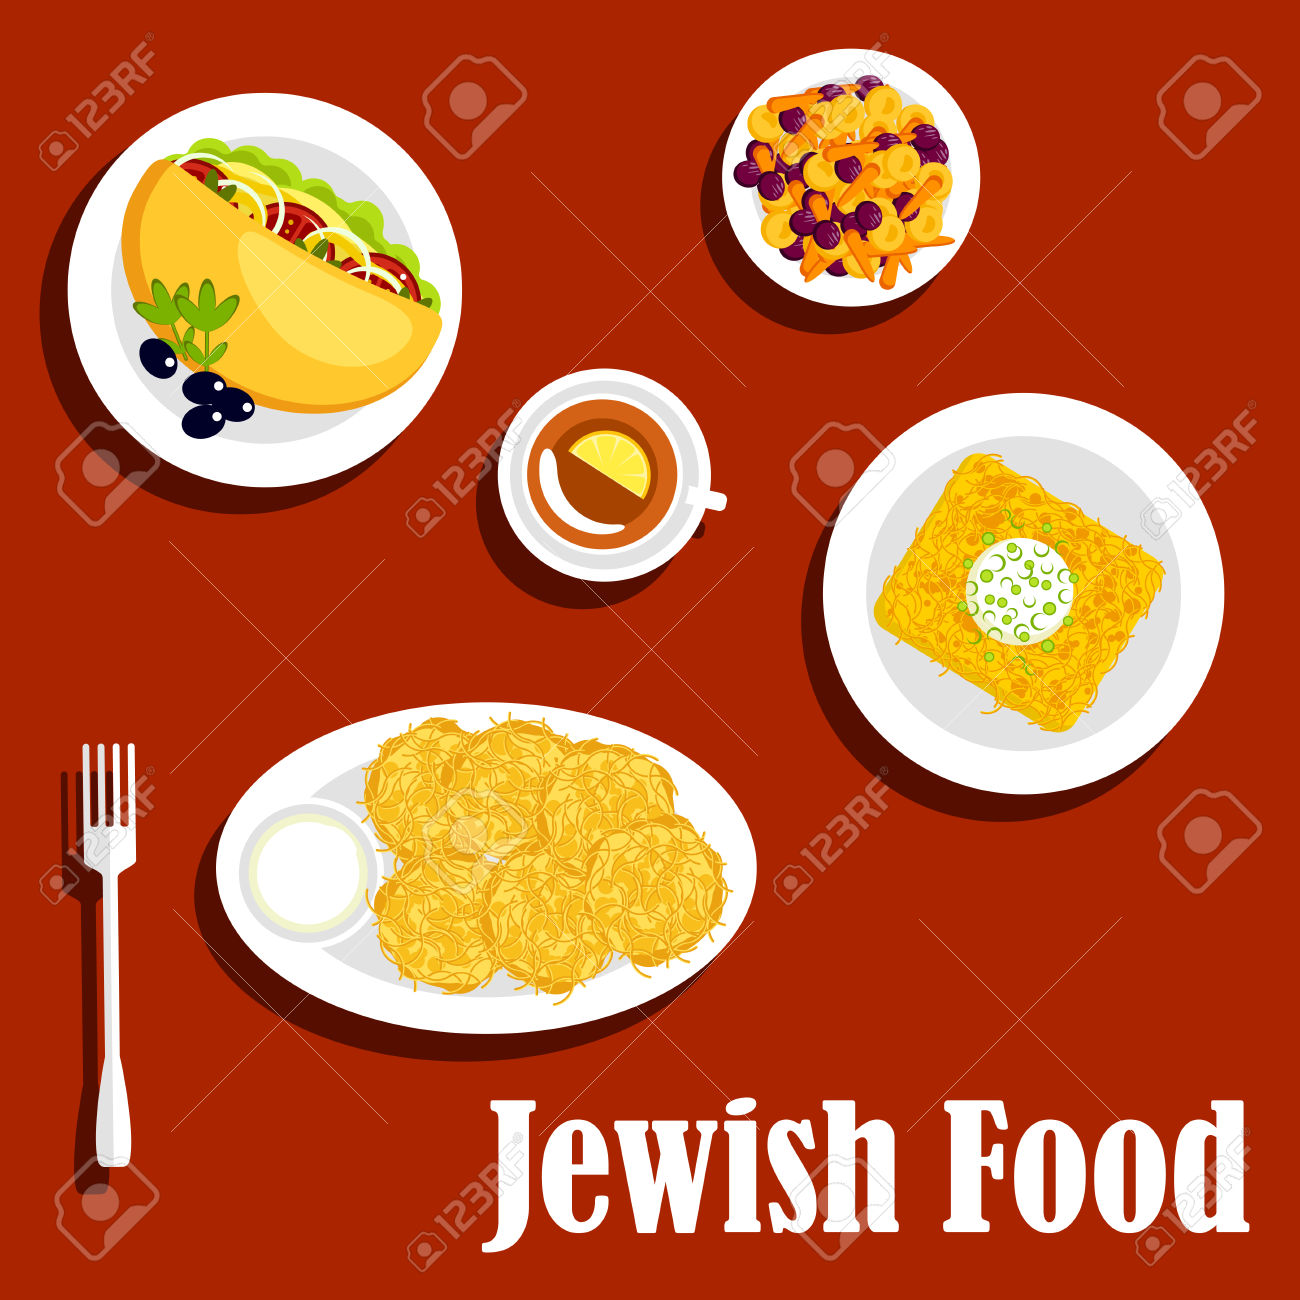 Traditional Vegetarian Jewish Food Menu Icons With Potato Pancakes.